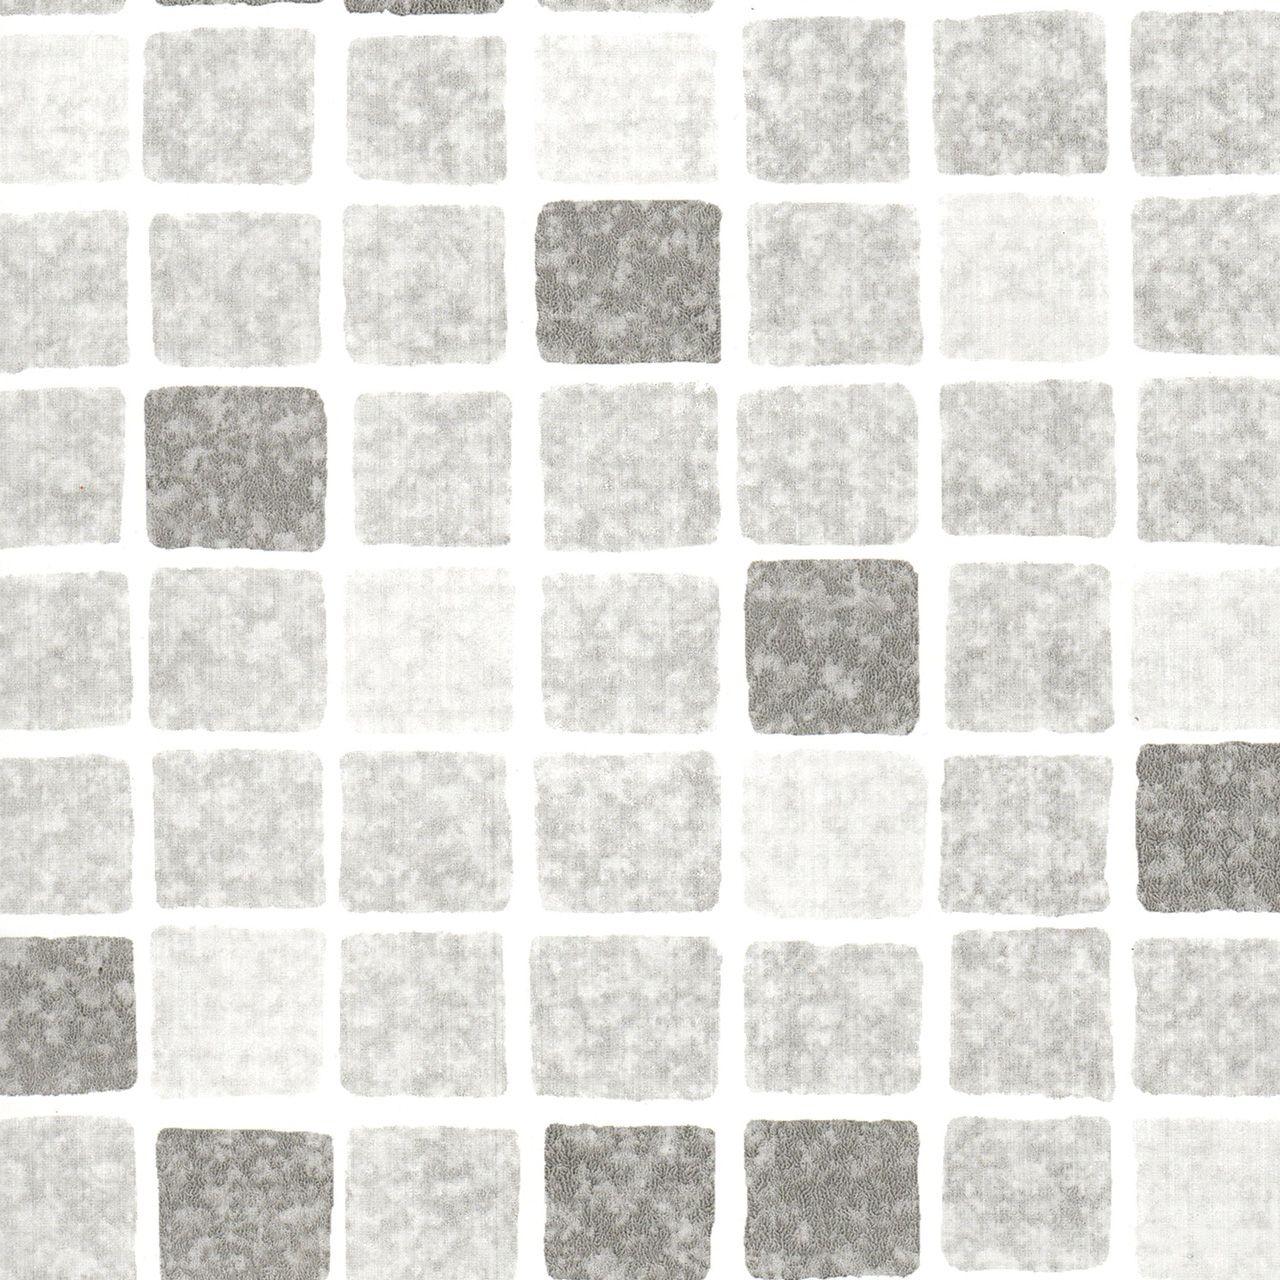 ELBE Supra ART Schwimmbadfolie Mosaik Grau